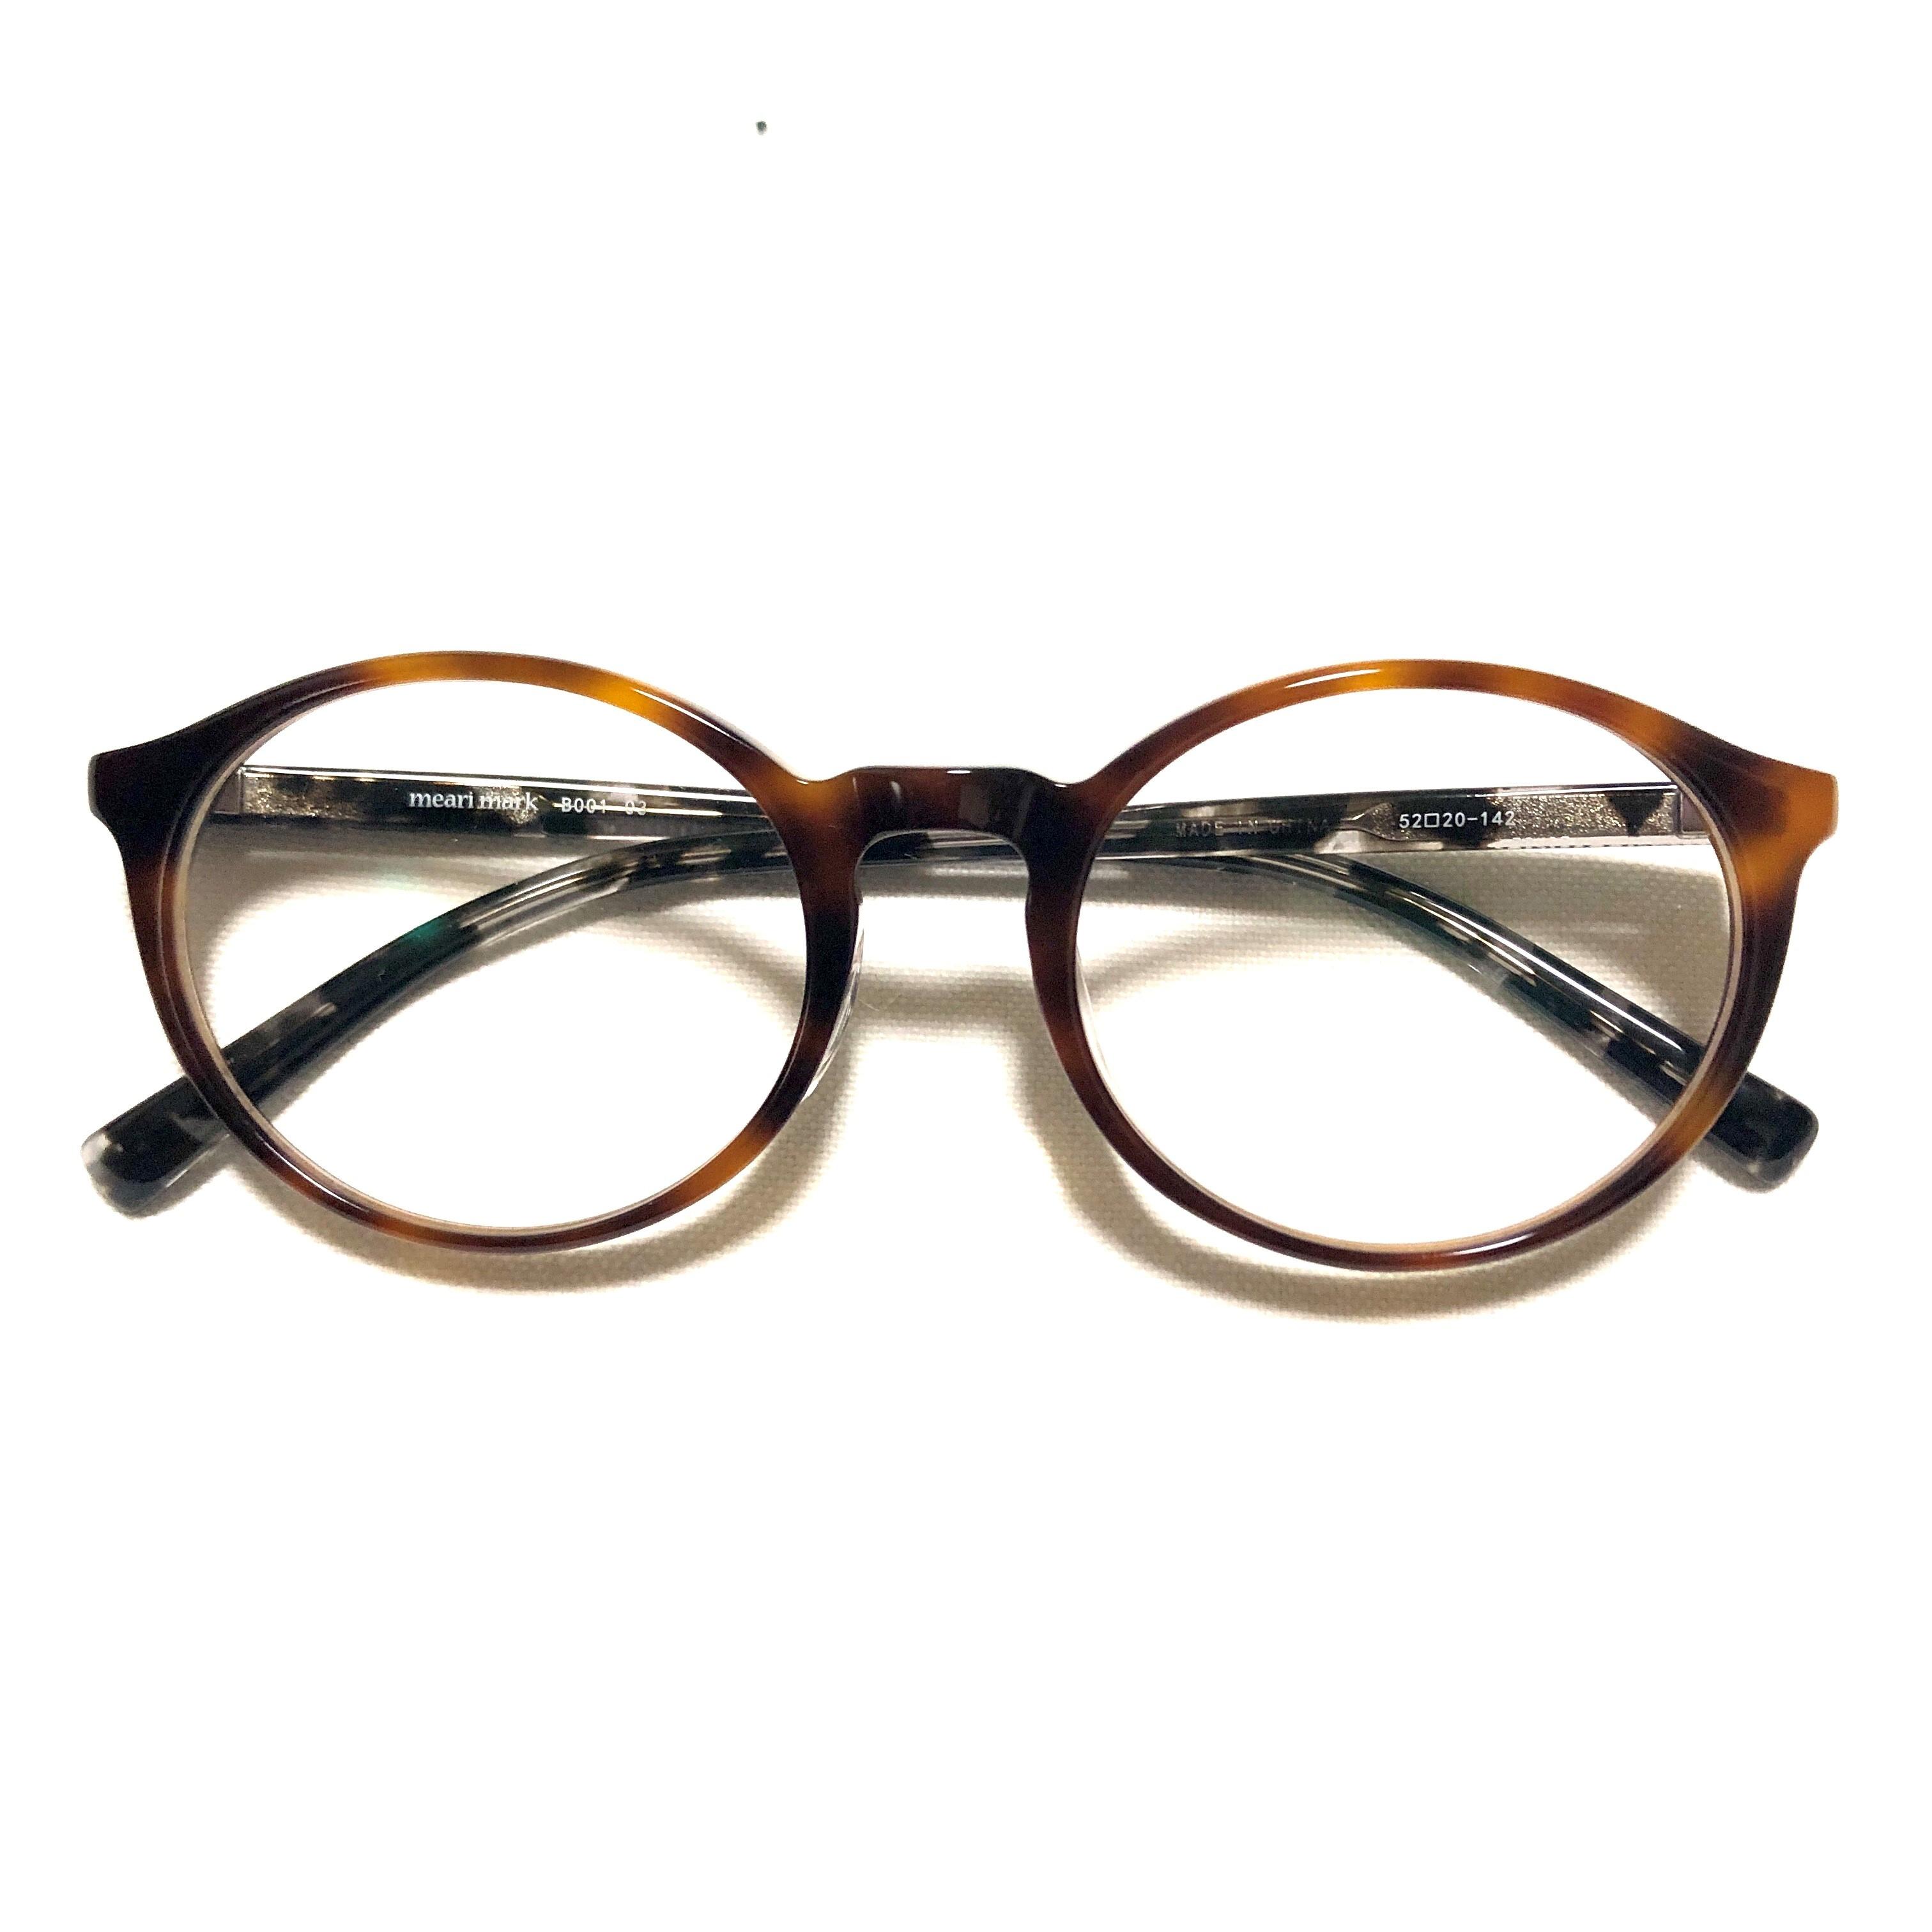 meari mark B001 03 (紫外線カットレンズ付きファッショングラス)